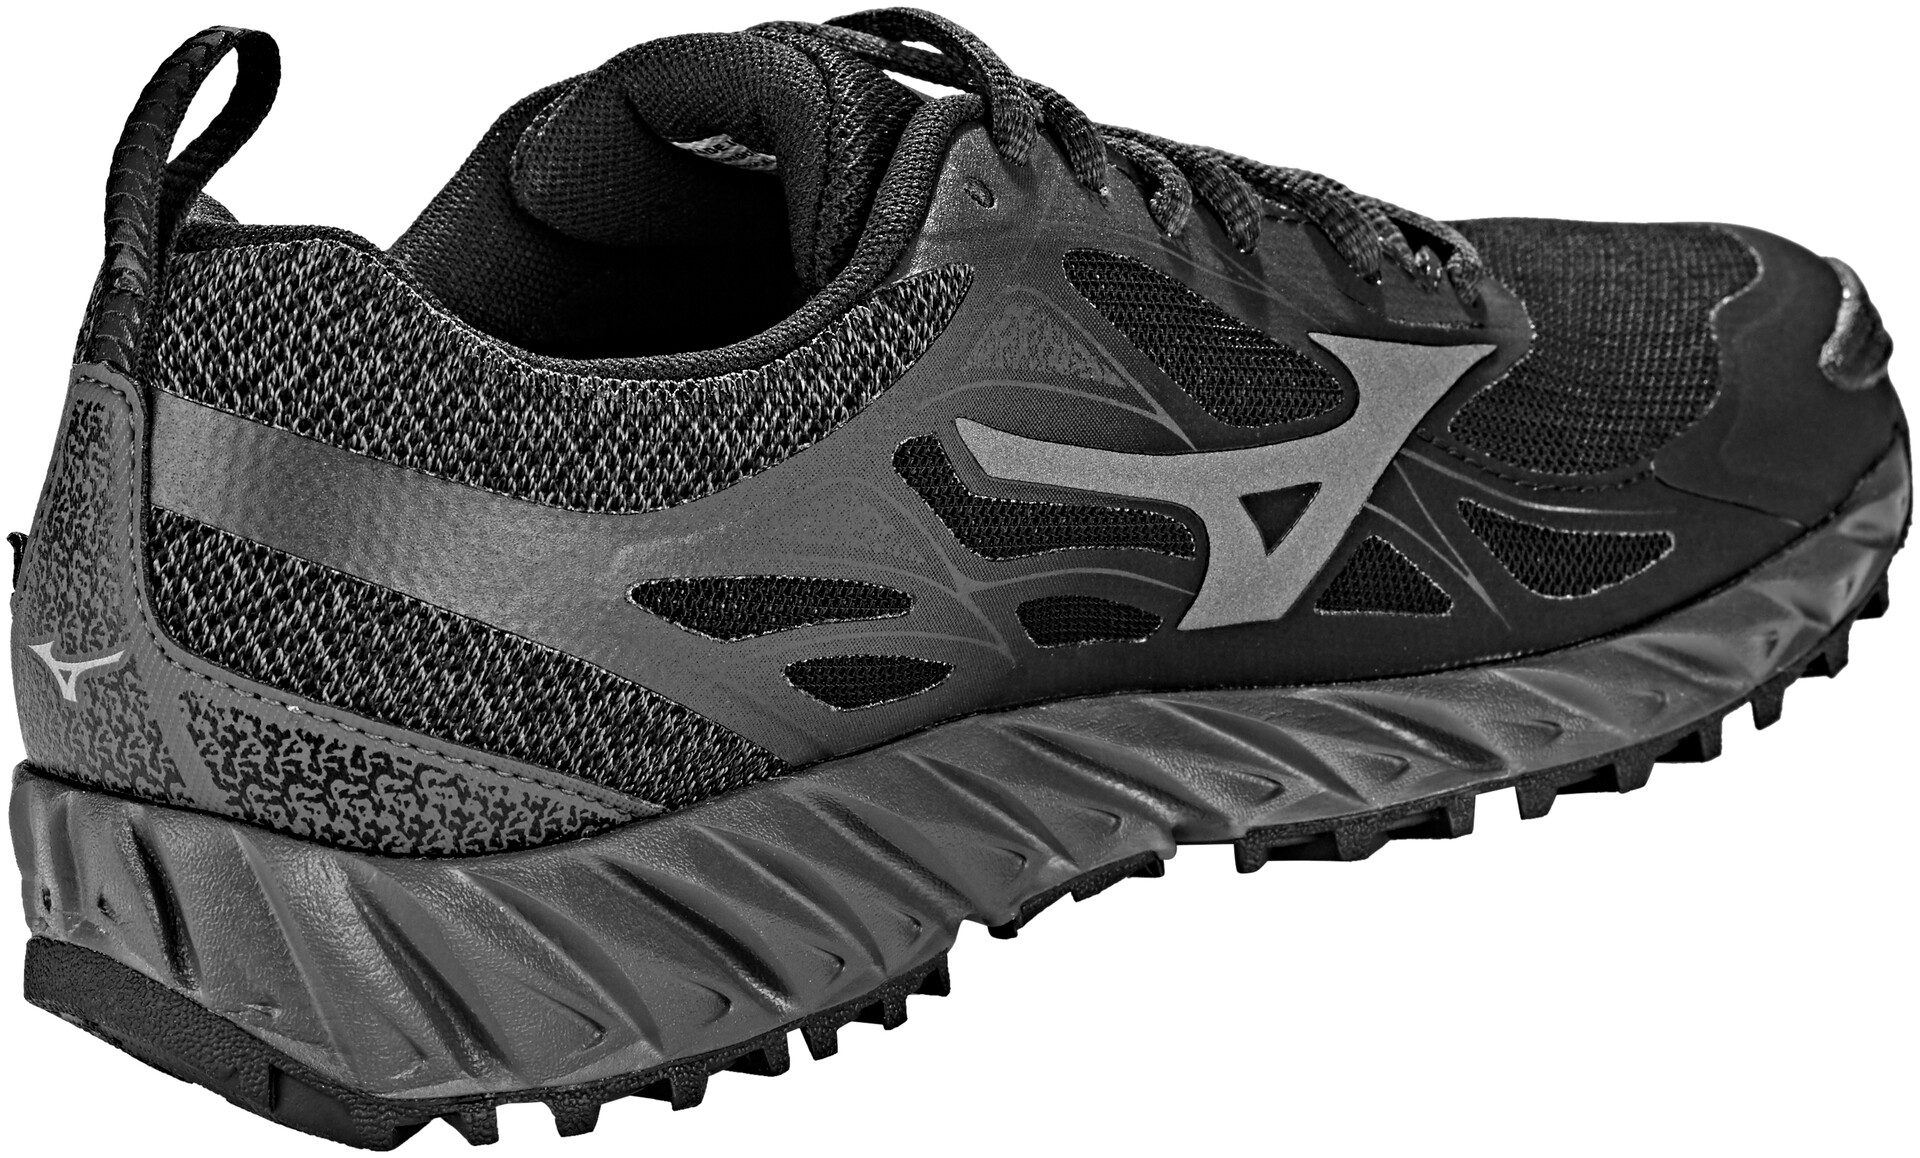 Mizuno Womens Wave Ibuki 2 GORE-TEX Trail Running Shoes Trainers Sneakers